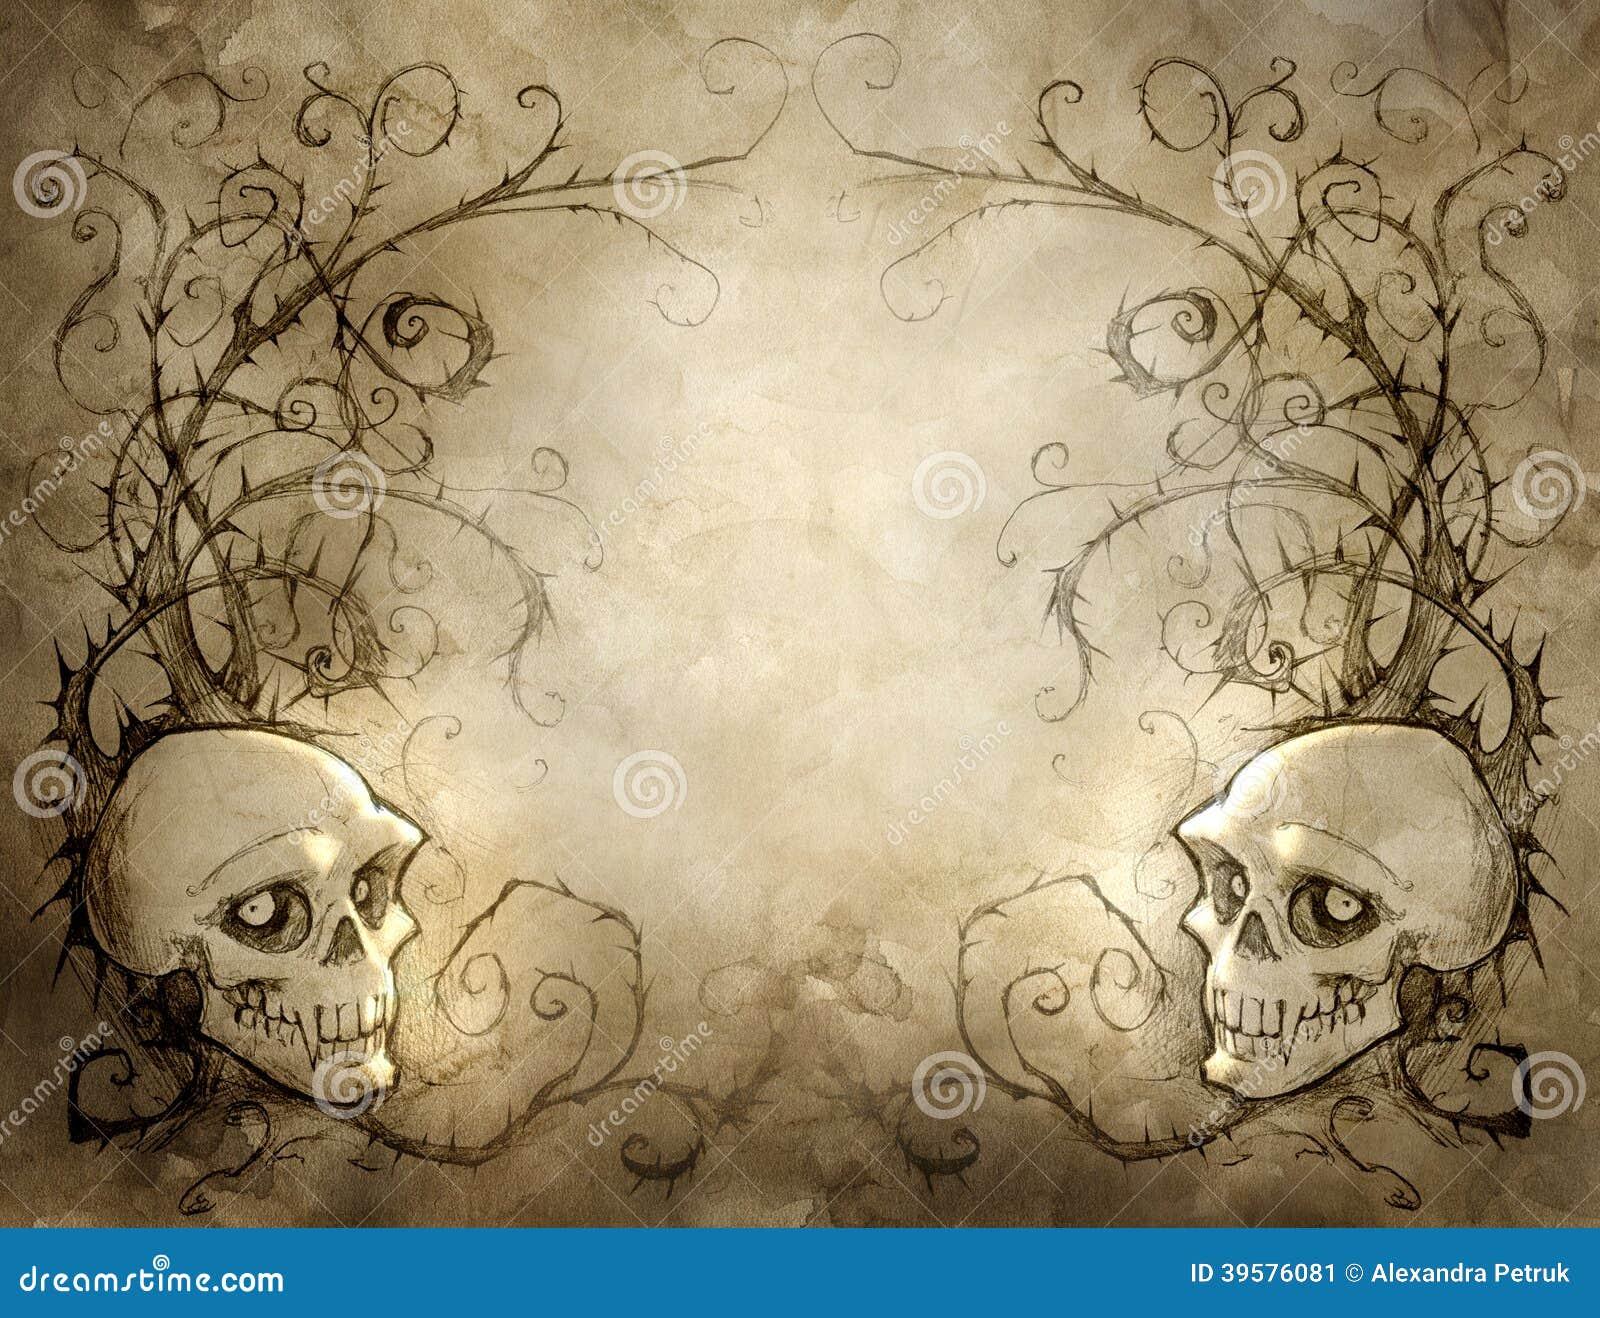 vintage halloween background stock illustration illustration of cover  dead 39576081 halloween signage vector Halloween Silhouette